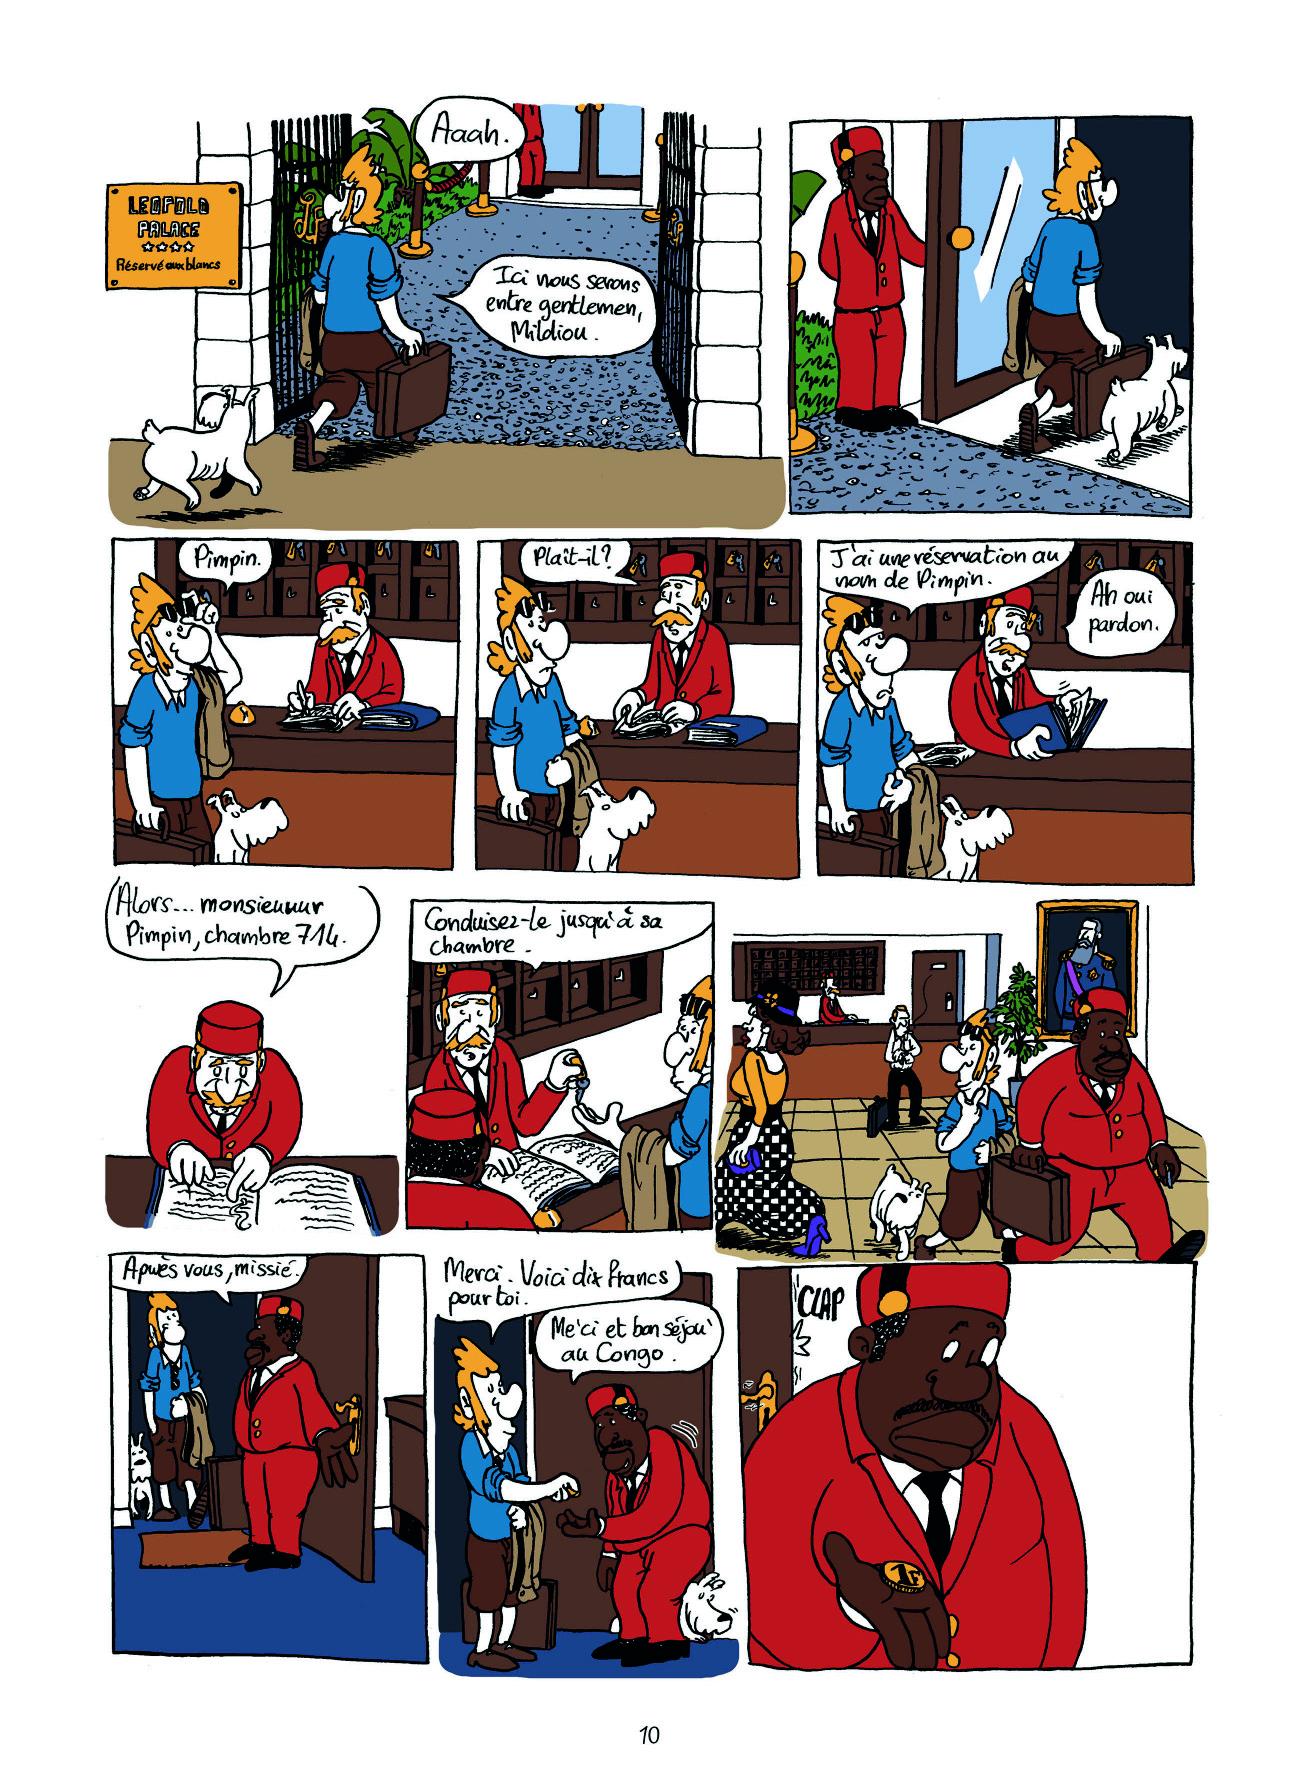 Extrait n°4 Lipanda par Bazil